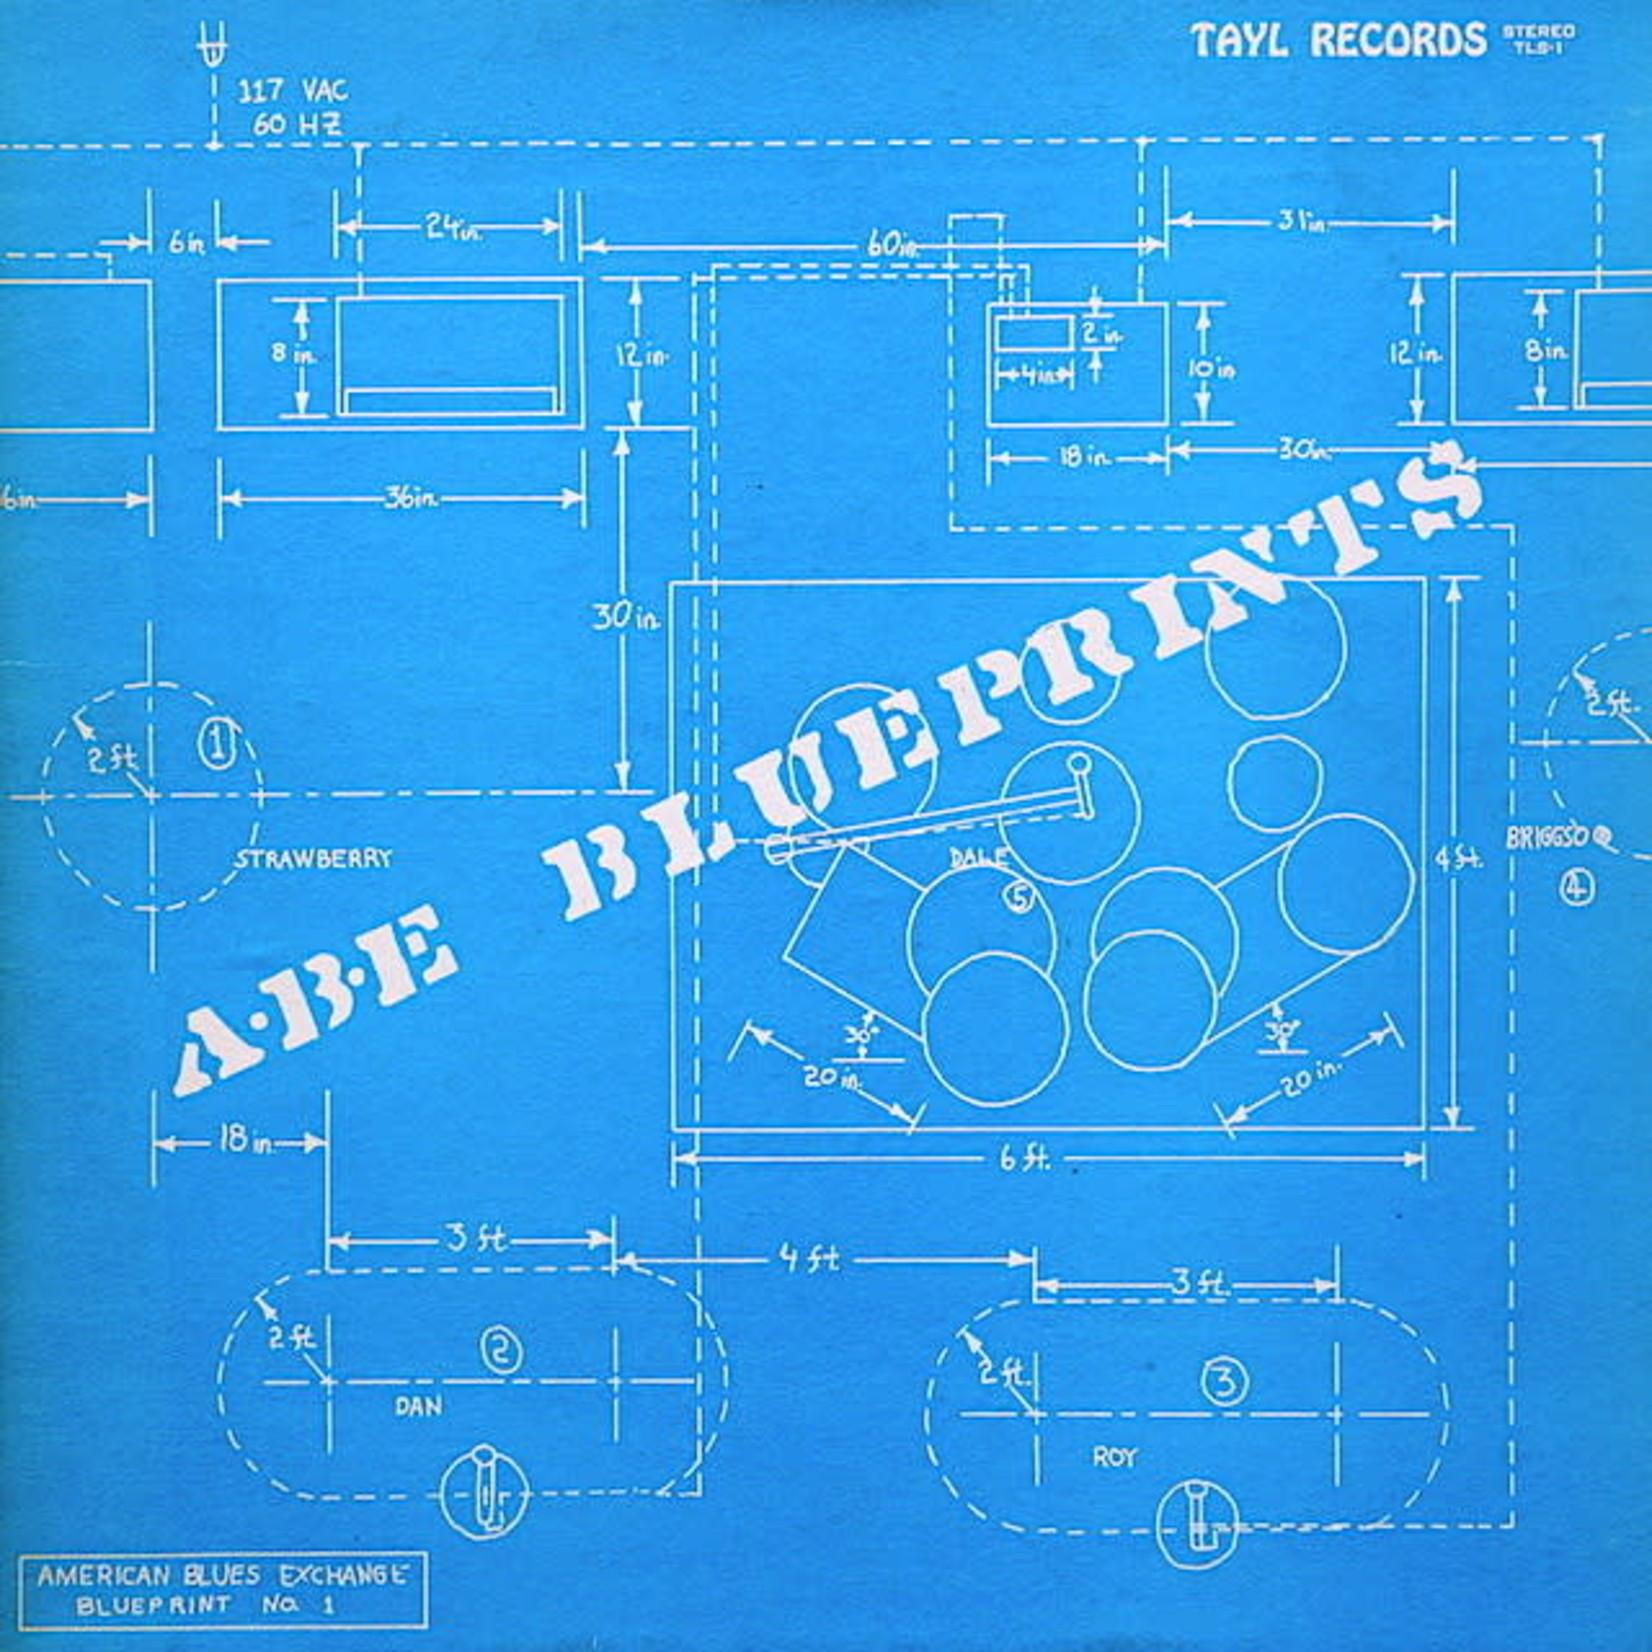 Vinyl American Blues Exchange - Blueprints